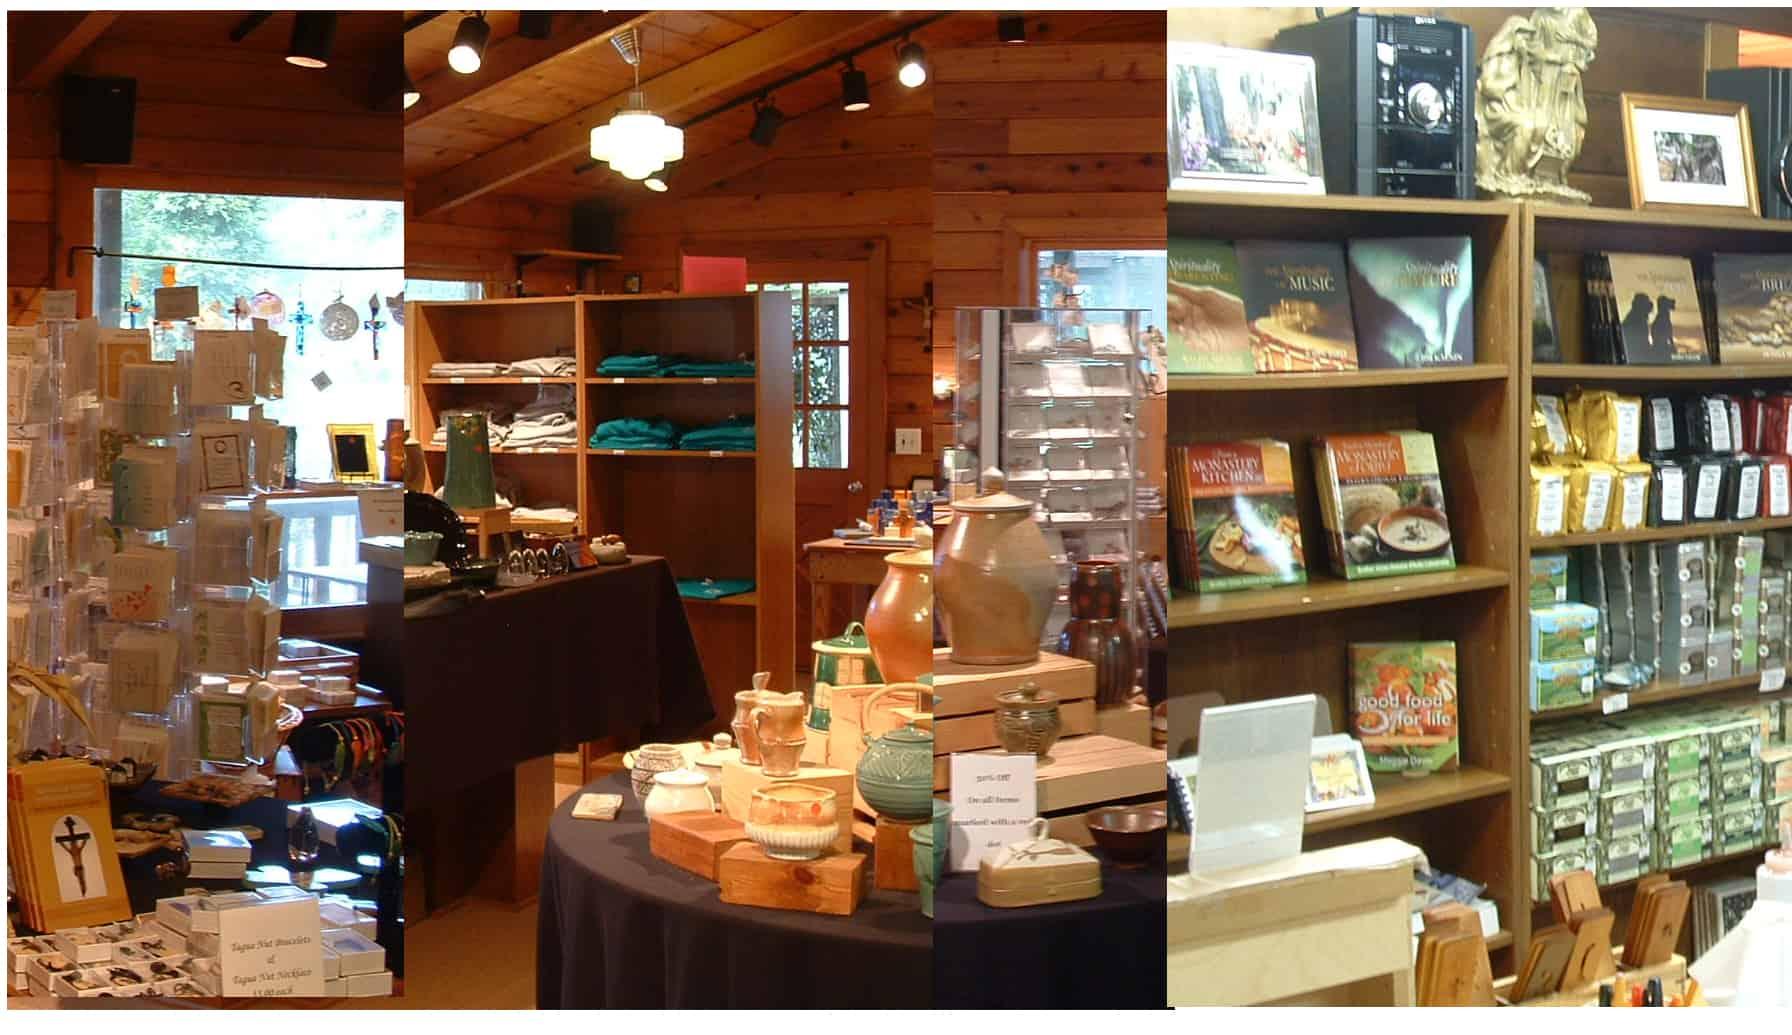 Mepkin abbey reception centergift shop mepkin abbey mepkin abbey books available negle Gallery